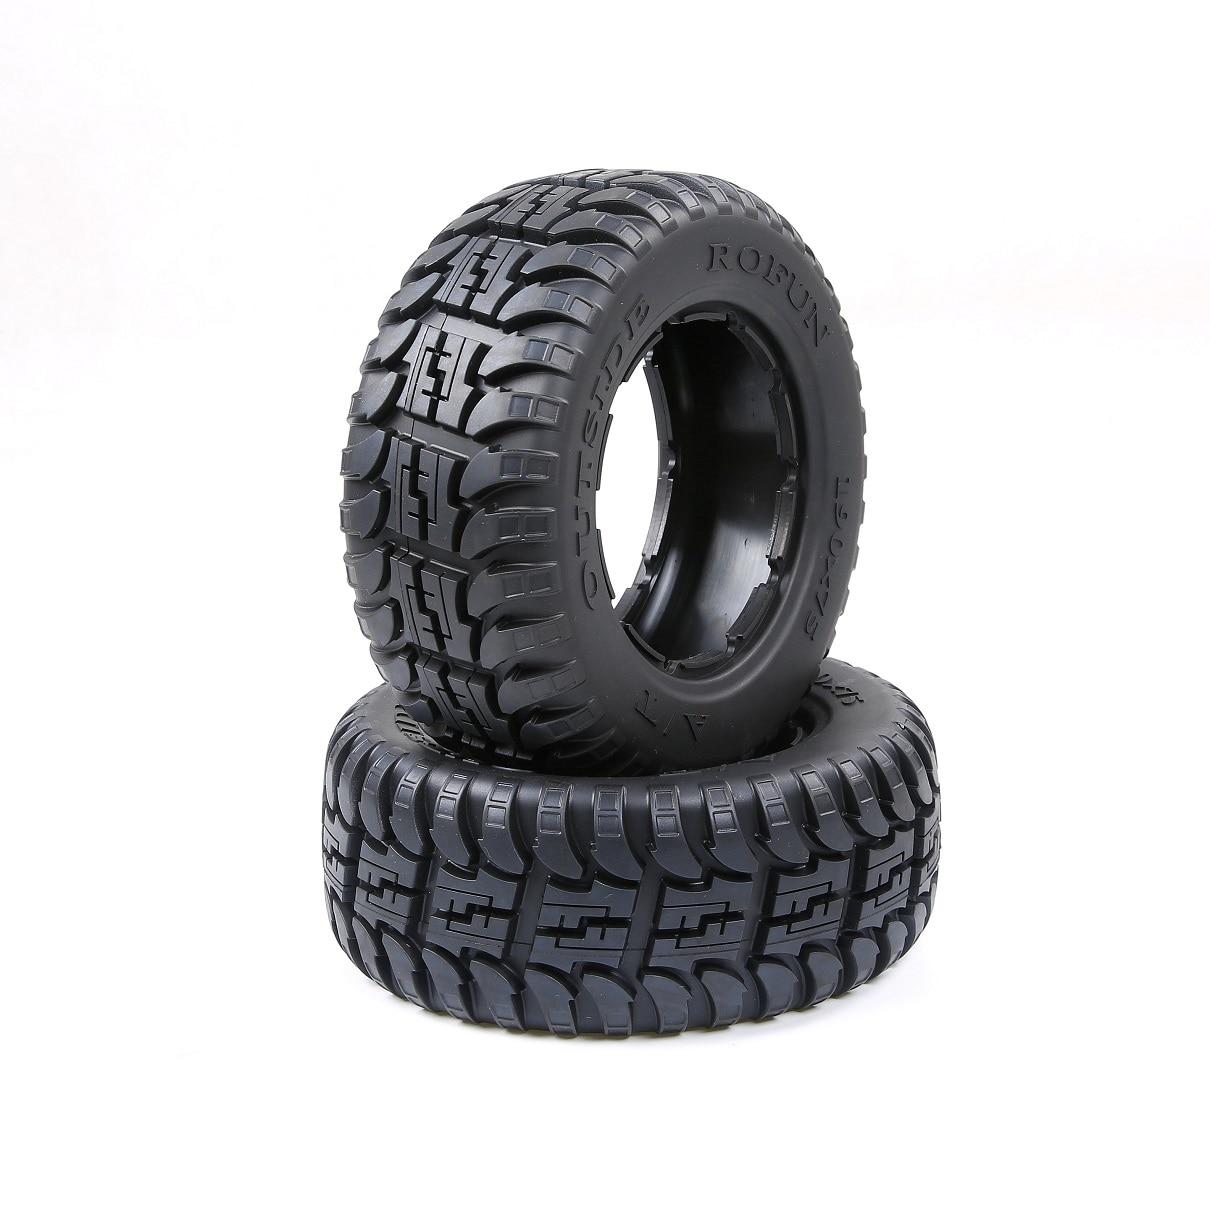 Details about  /All-terrain Front Tire Skin 190 65mm Fit 1//5 HPI ROFUN BAHA RV KM BAJA 5T 5SC